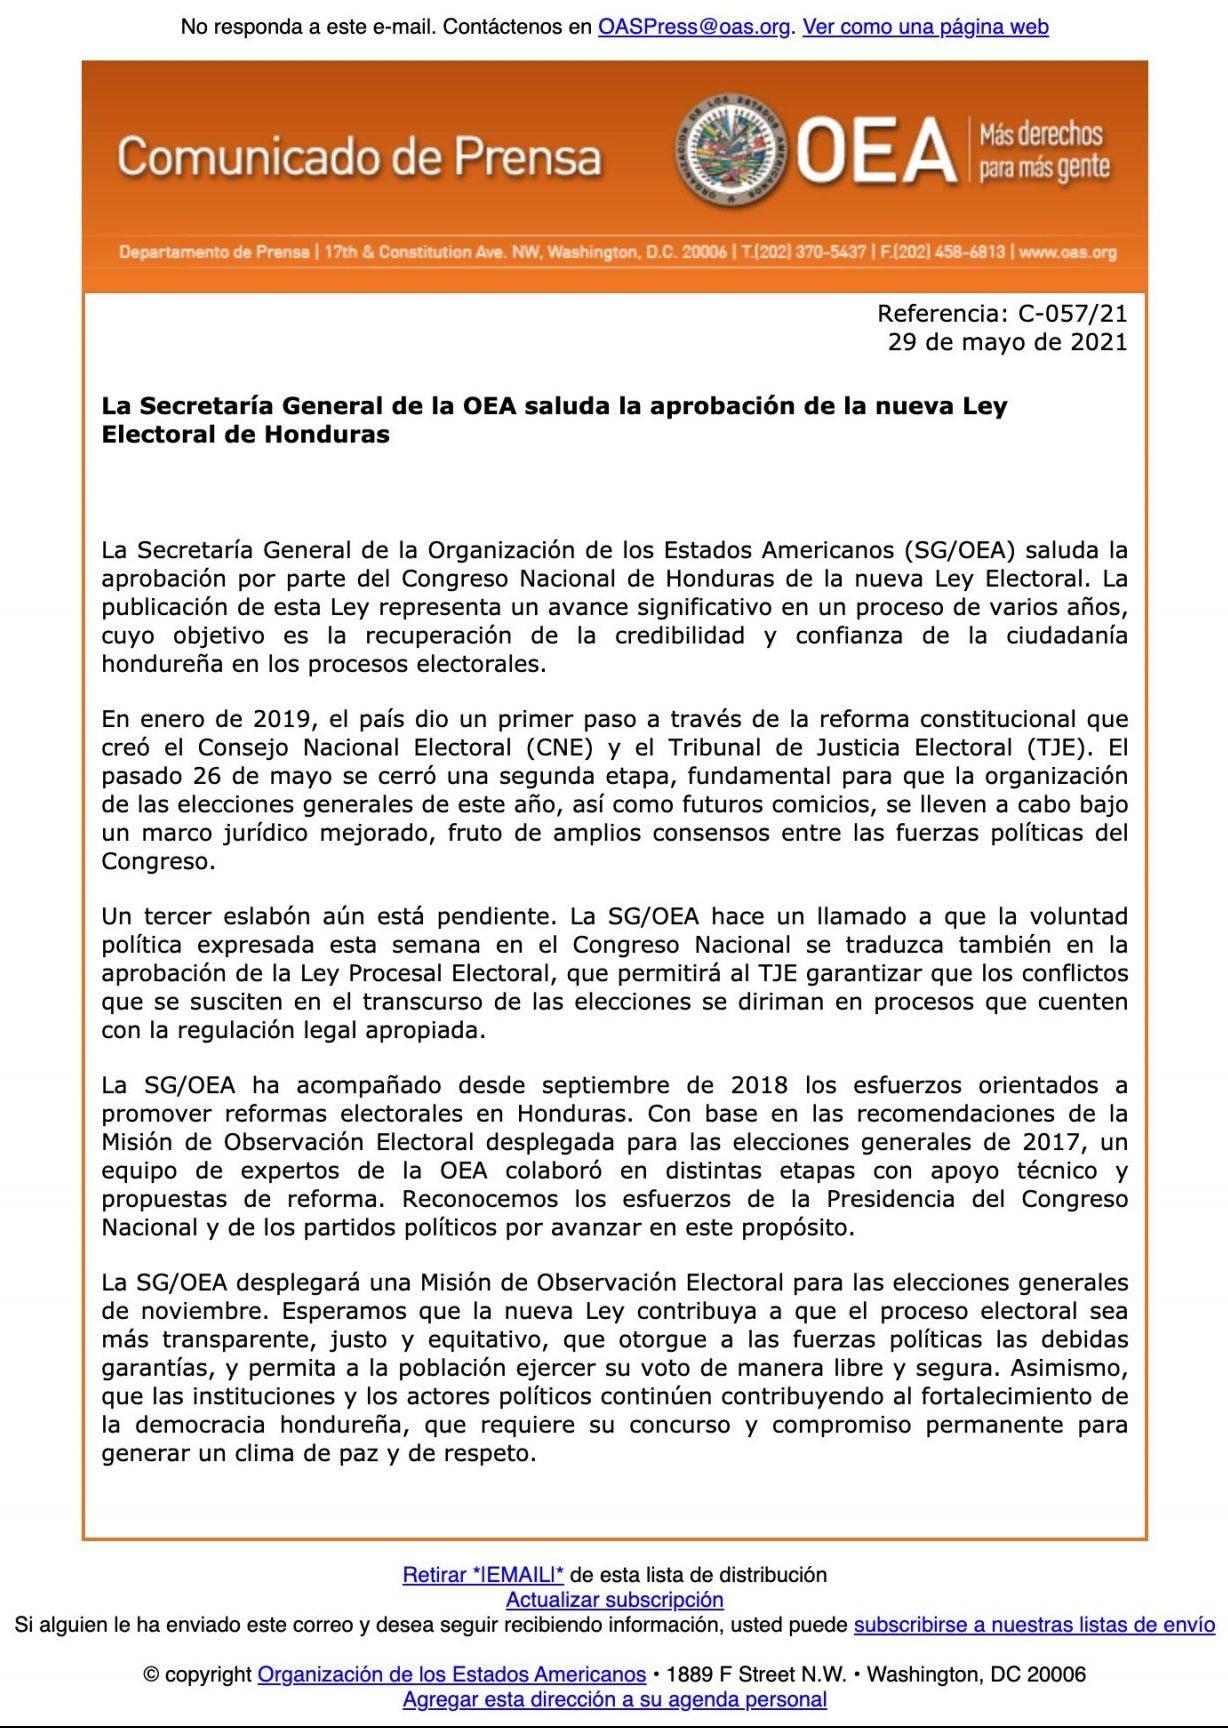 Comunicado emitido hoy por la OEA.